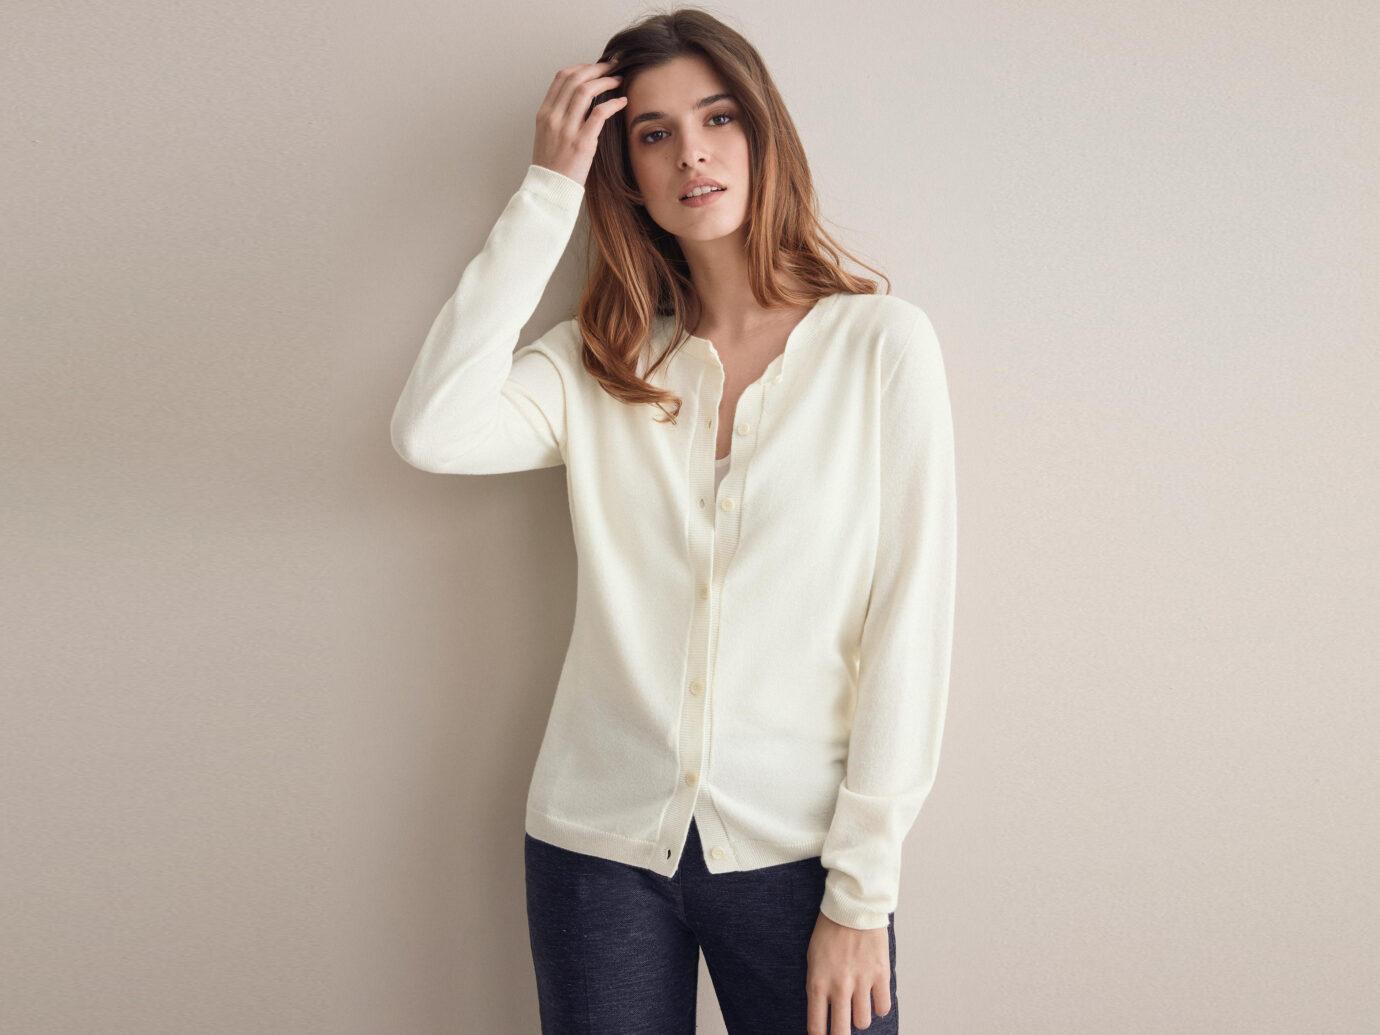 Falconeri Ultra-Soft Cashmere Cardigan